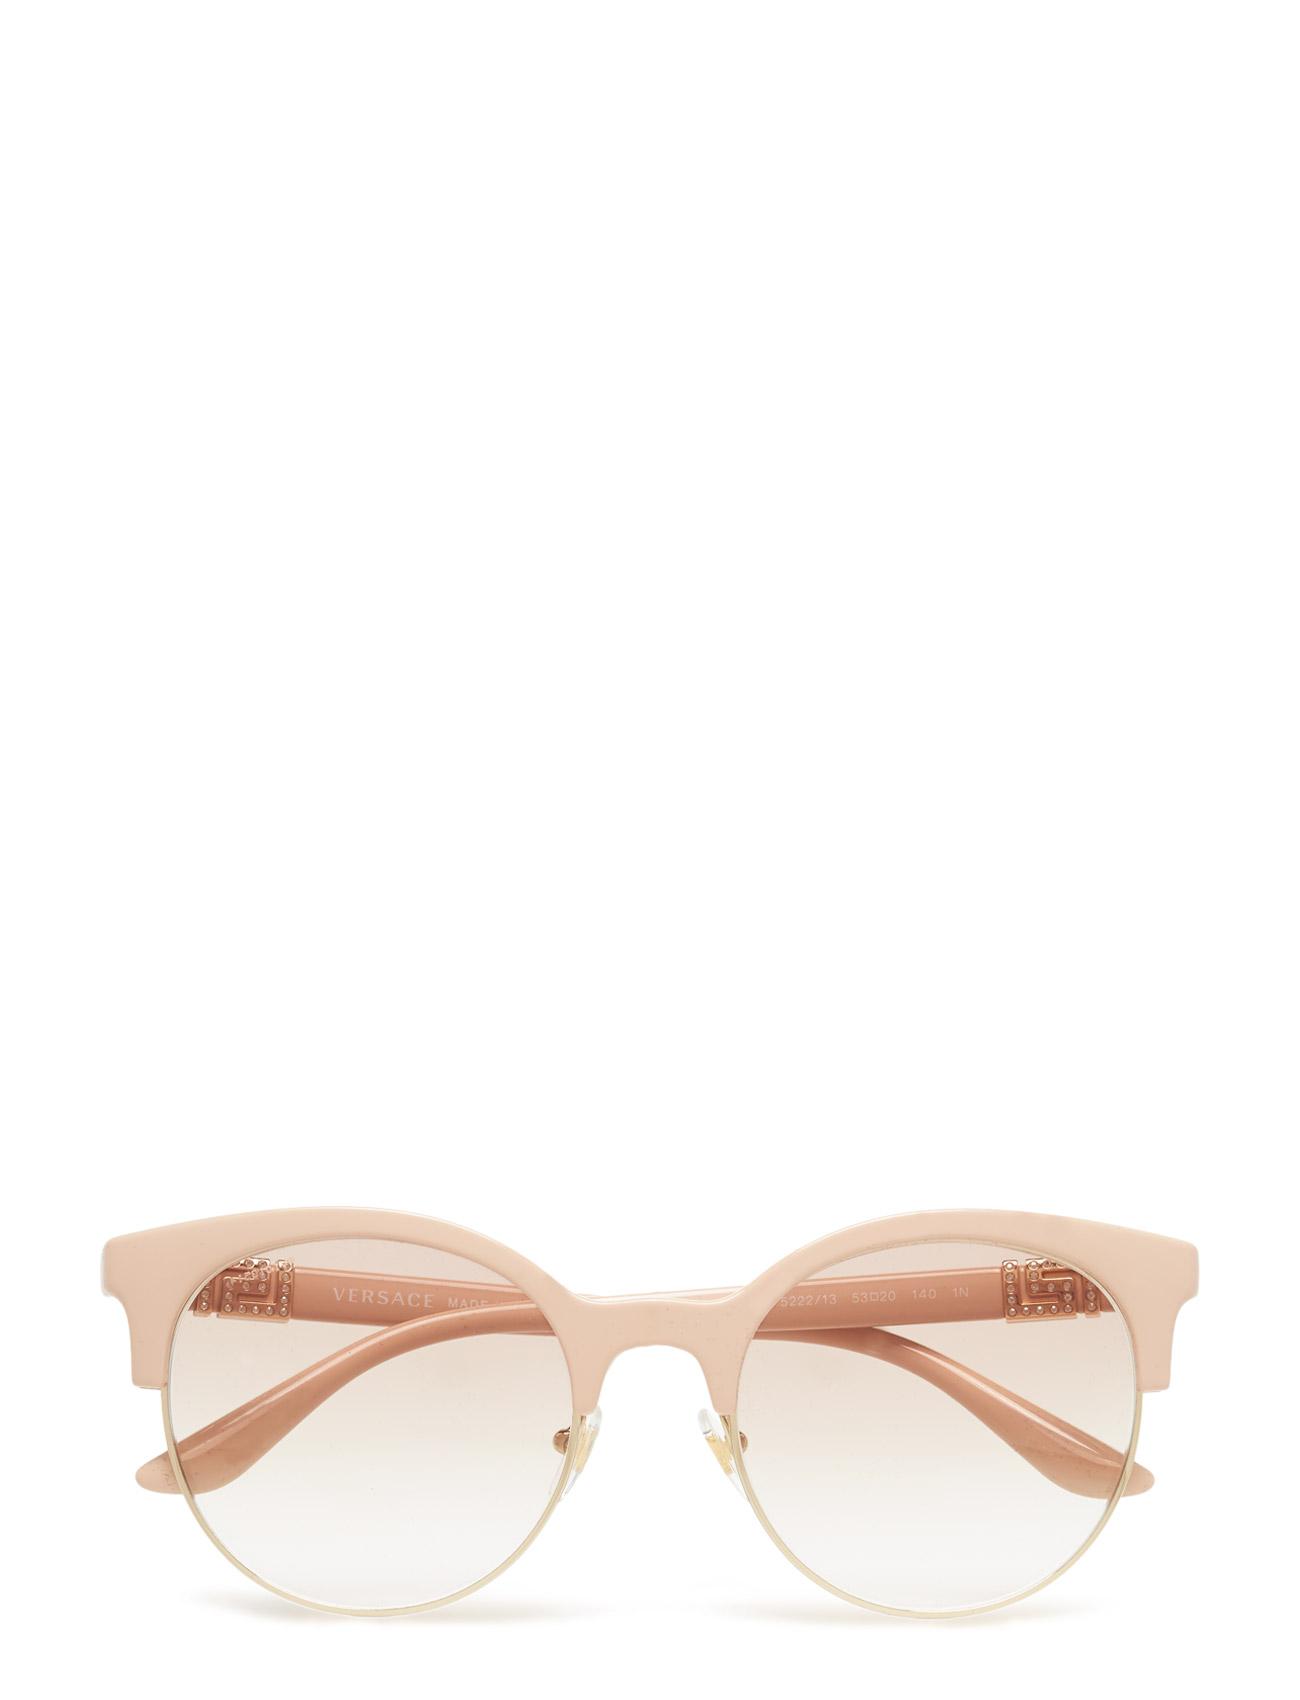 versace sunglasses Pop chic | greca strass fra boozt.com dk